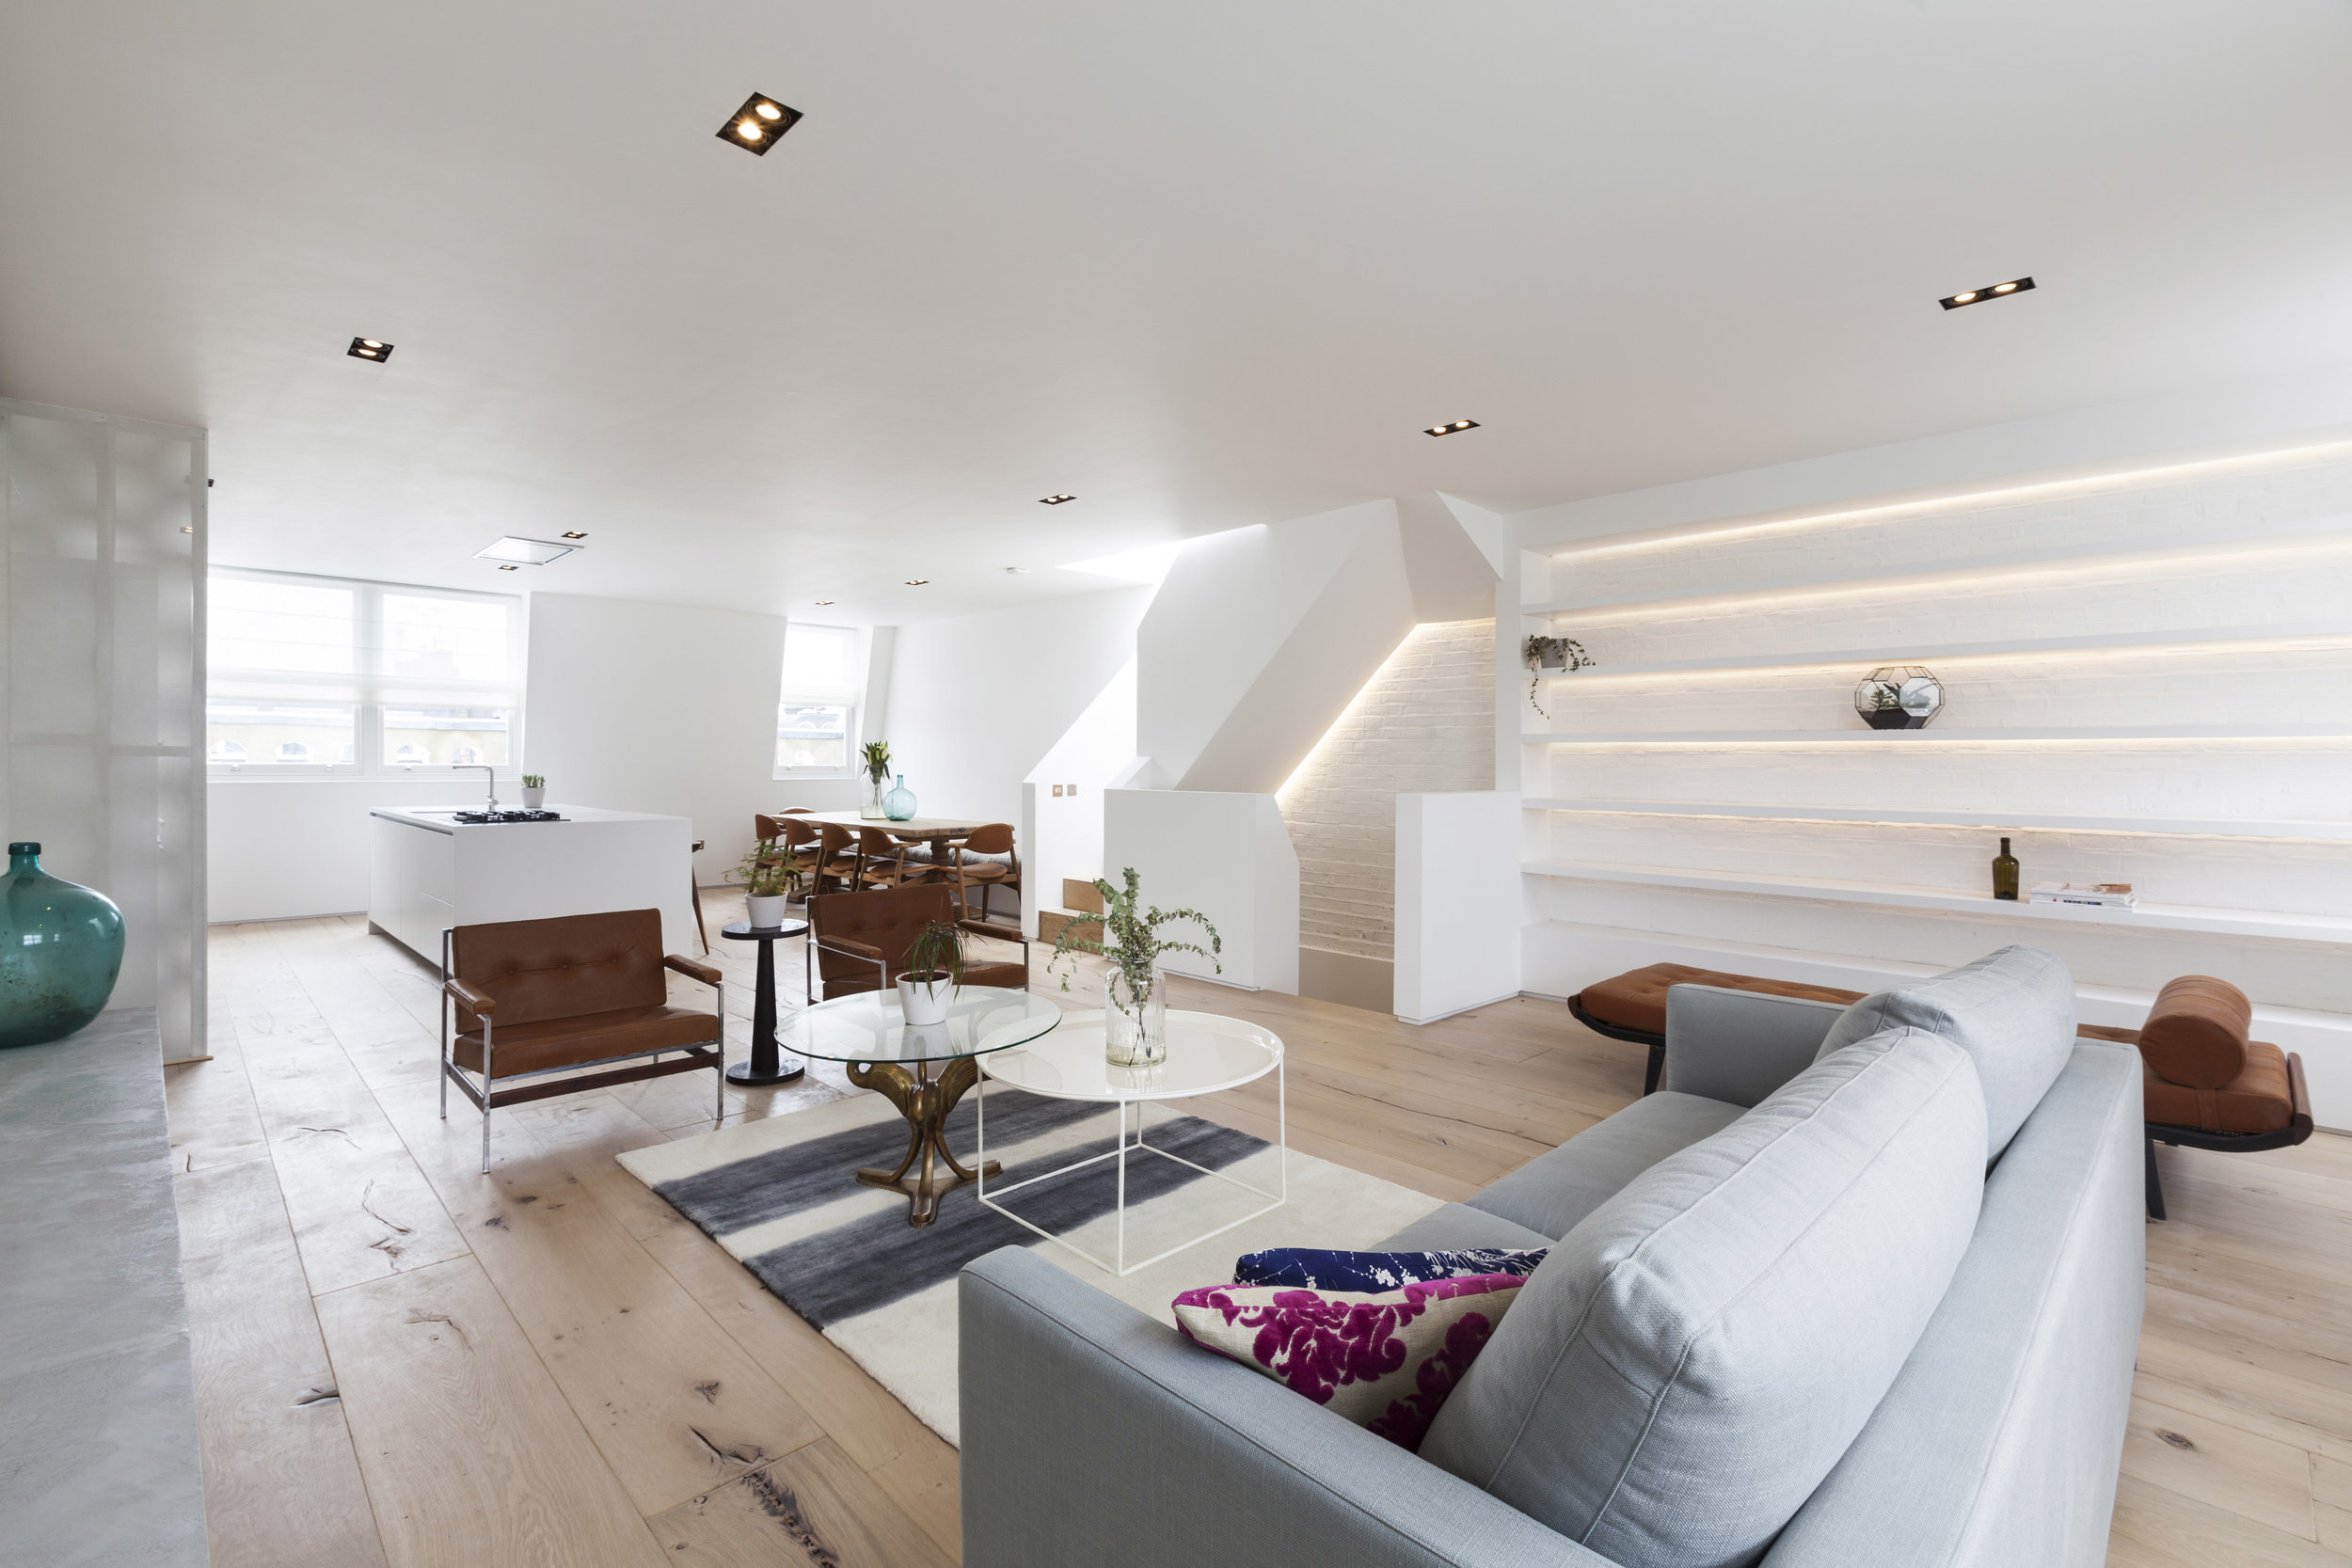 Domus-Nova-Sinclair-Road-London-Property-For-Sale-155.jpg